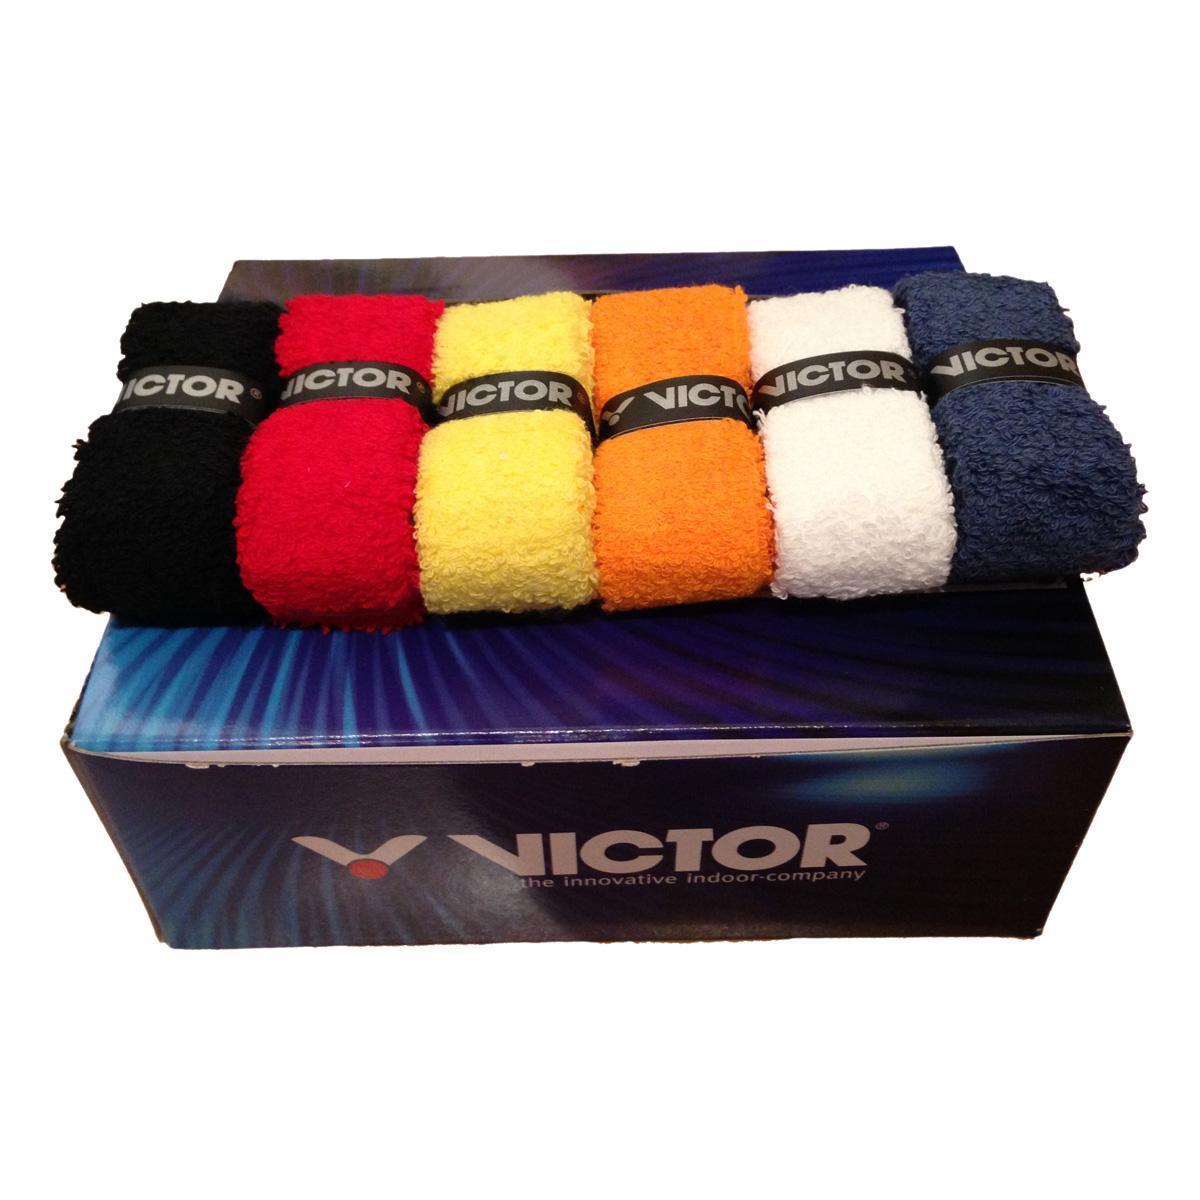 Publix Sweat Towel: Victor Badminton Towel Grips